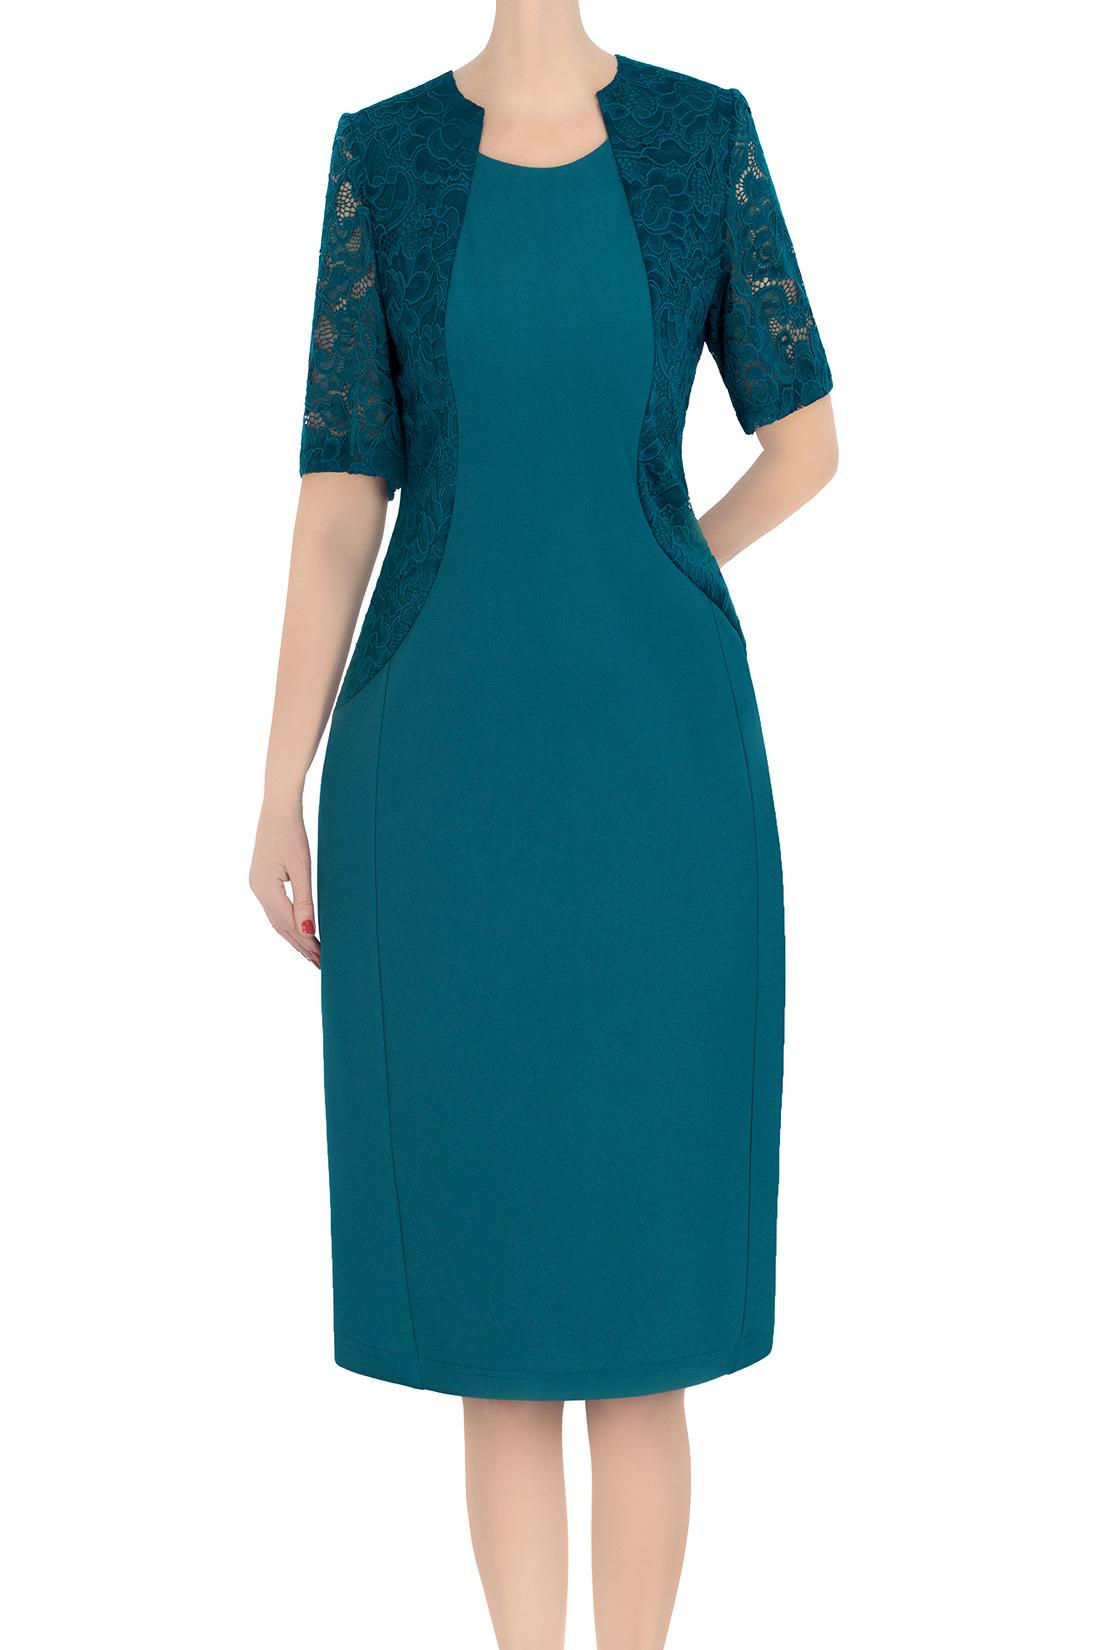 be50b60c35 Klasyczna sukienka damska Zosia morska 3379 Kliknij